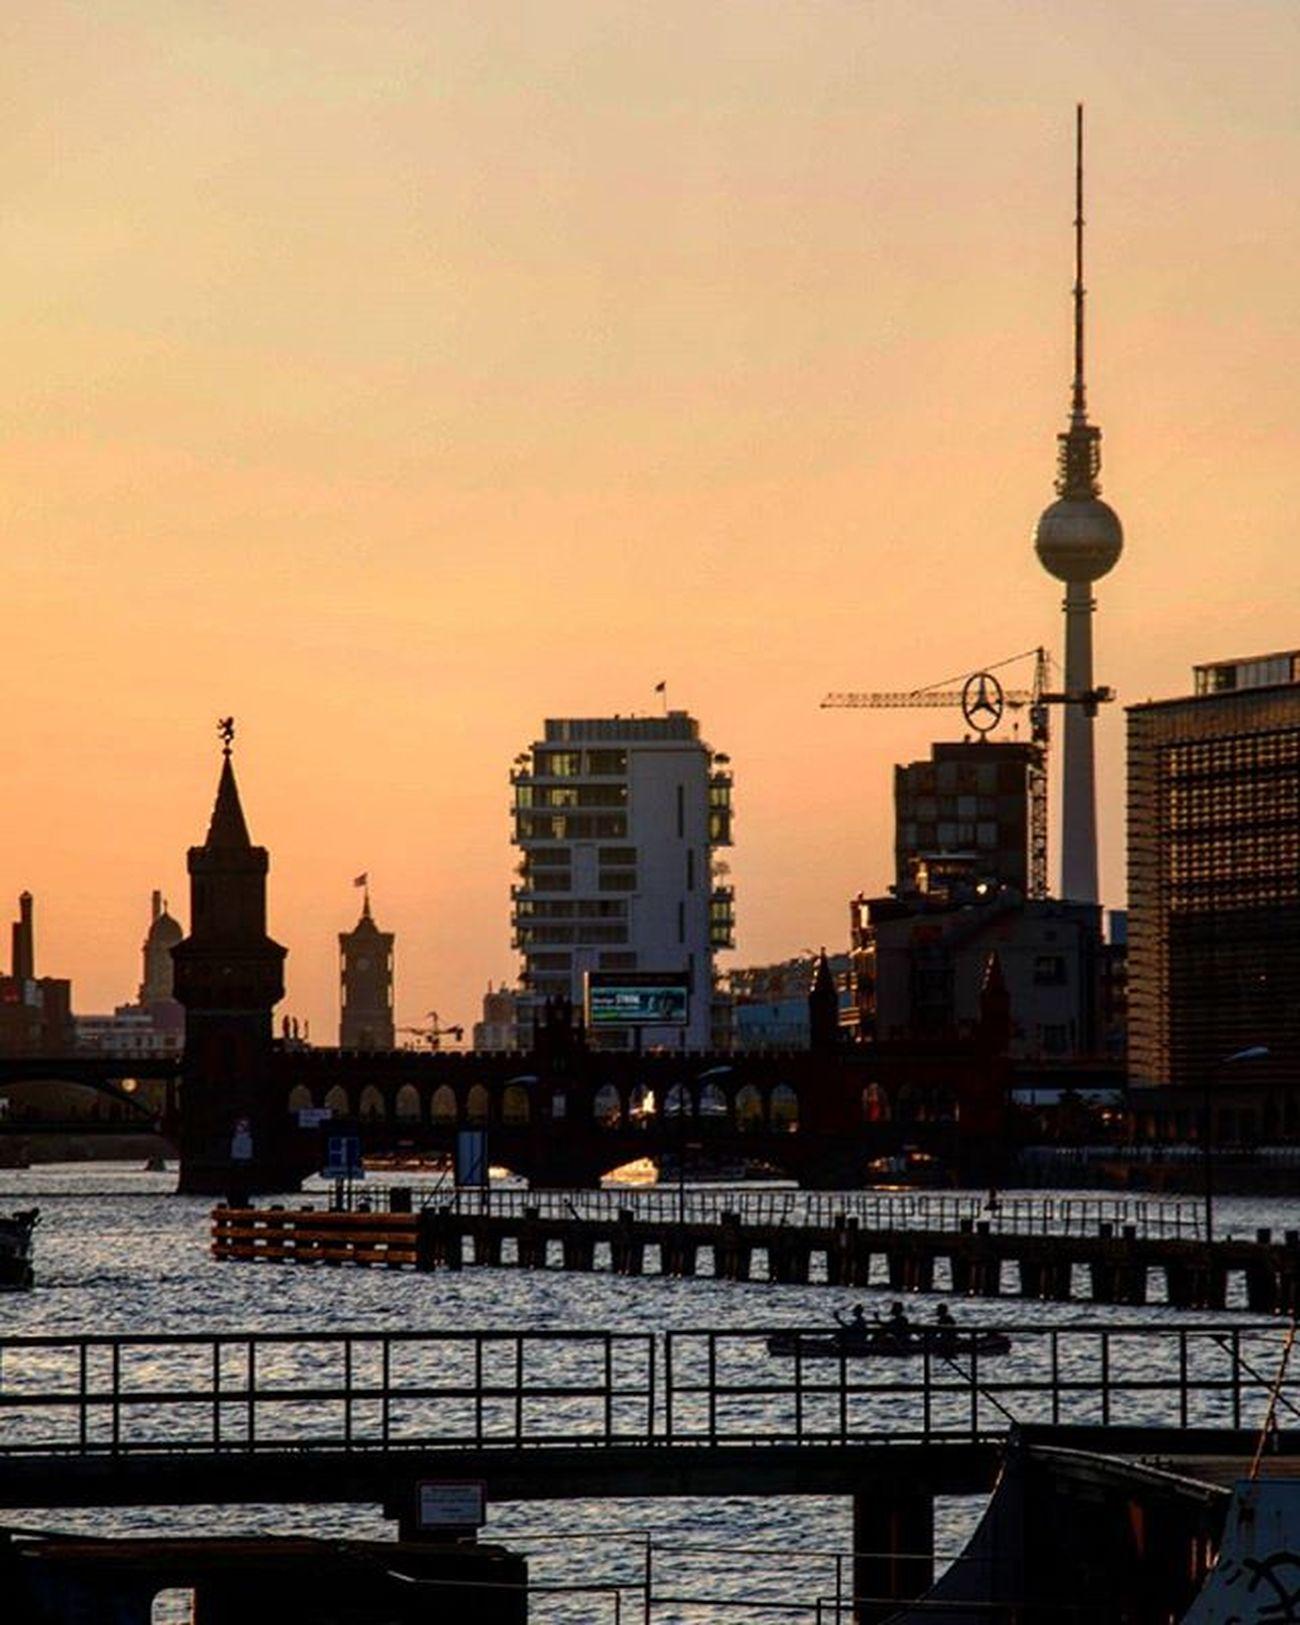 Germany Deutschland Berlin Oberbaumbrücke Oberbaumbrücke Oberbaumbridge Fernsehturm Fernsehturmberlin SpreeRiver Spree River Sunset